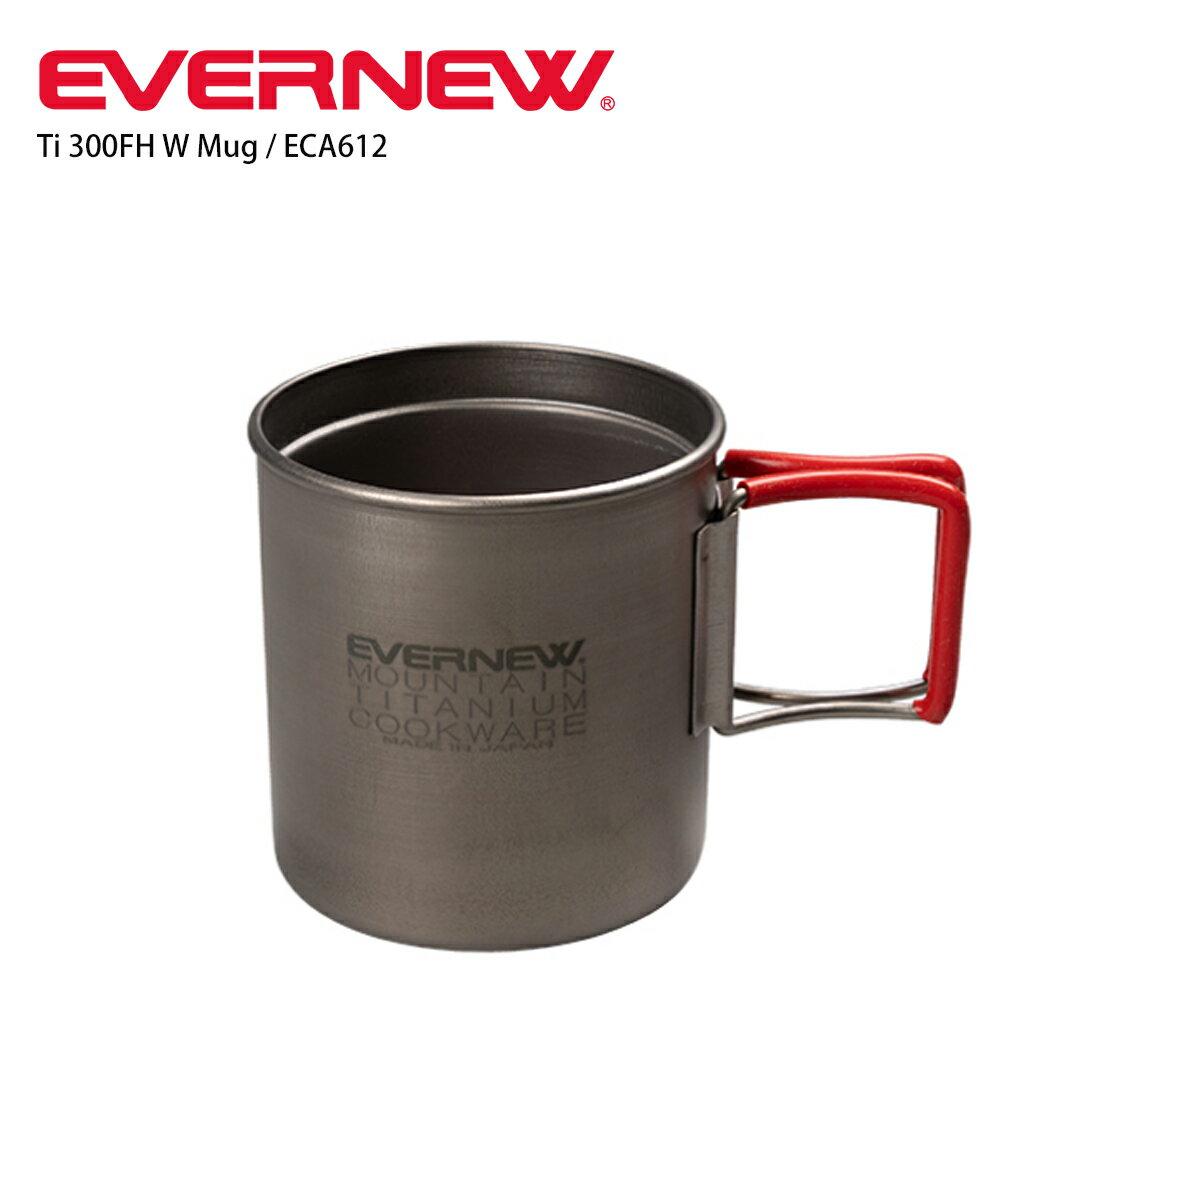 EVERNEW(エバニュー)チタンマグカップ300FH